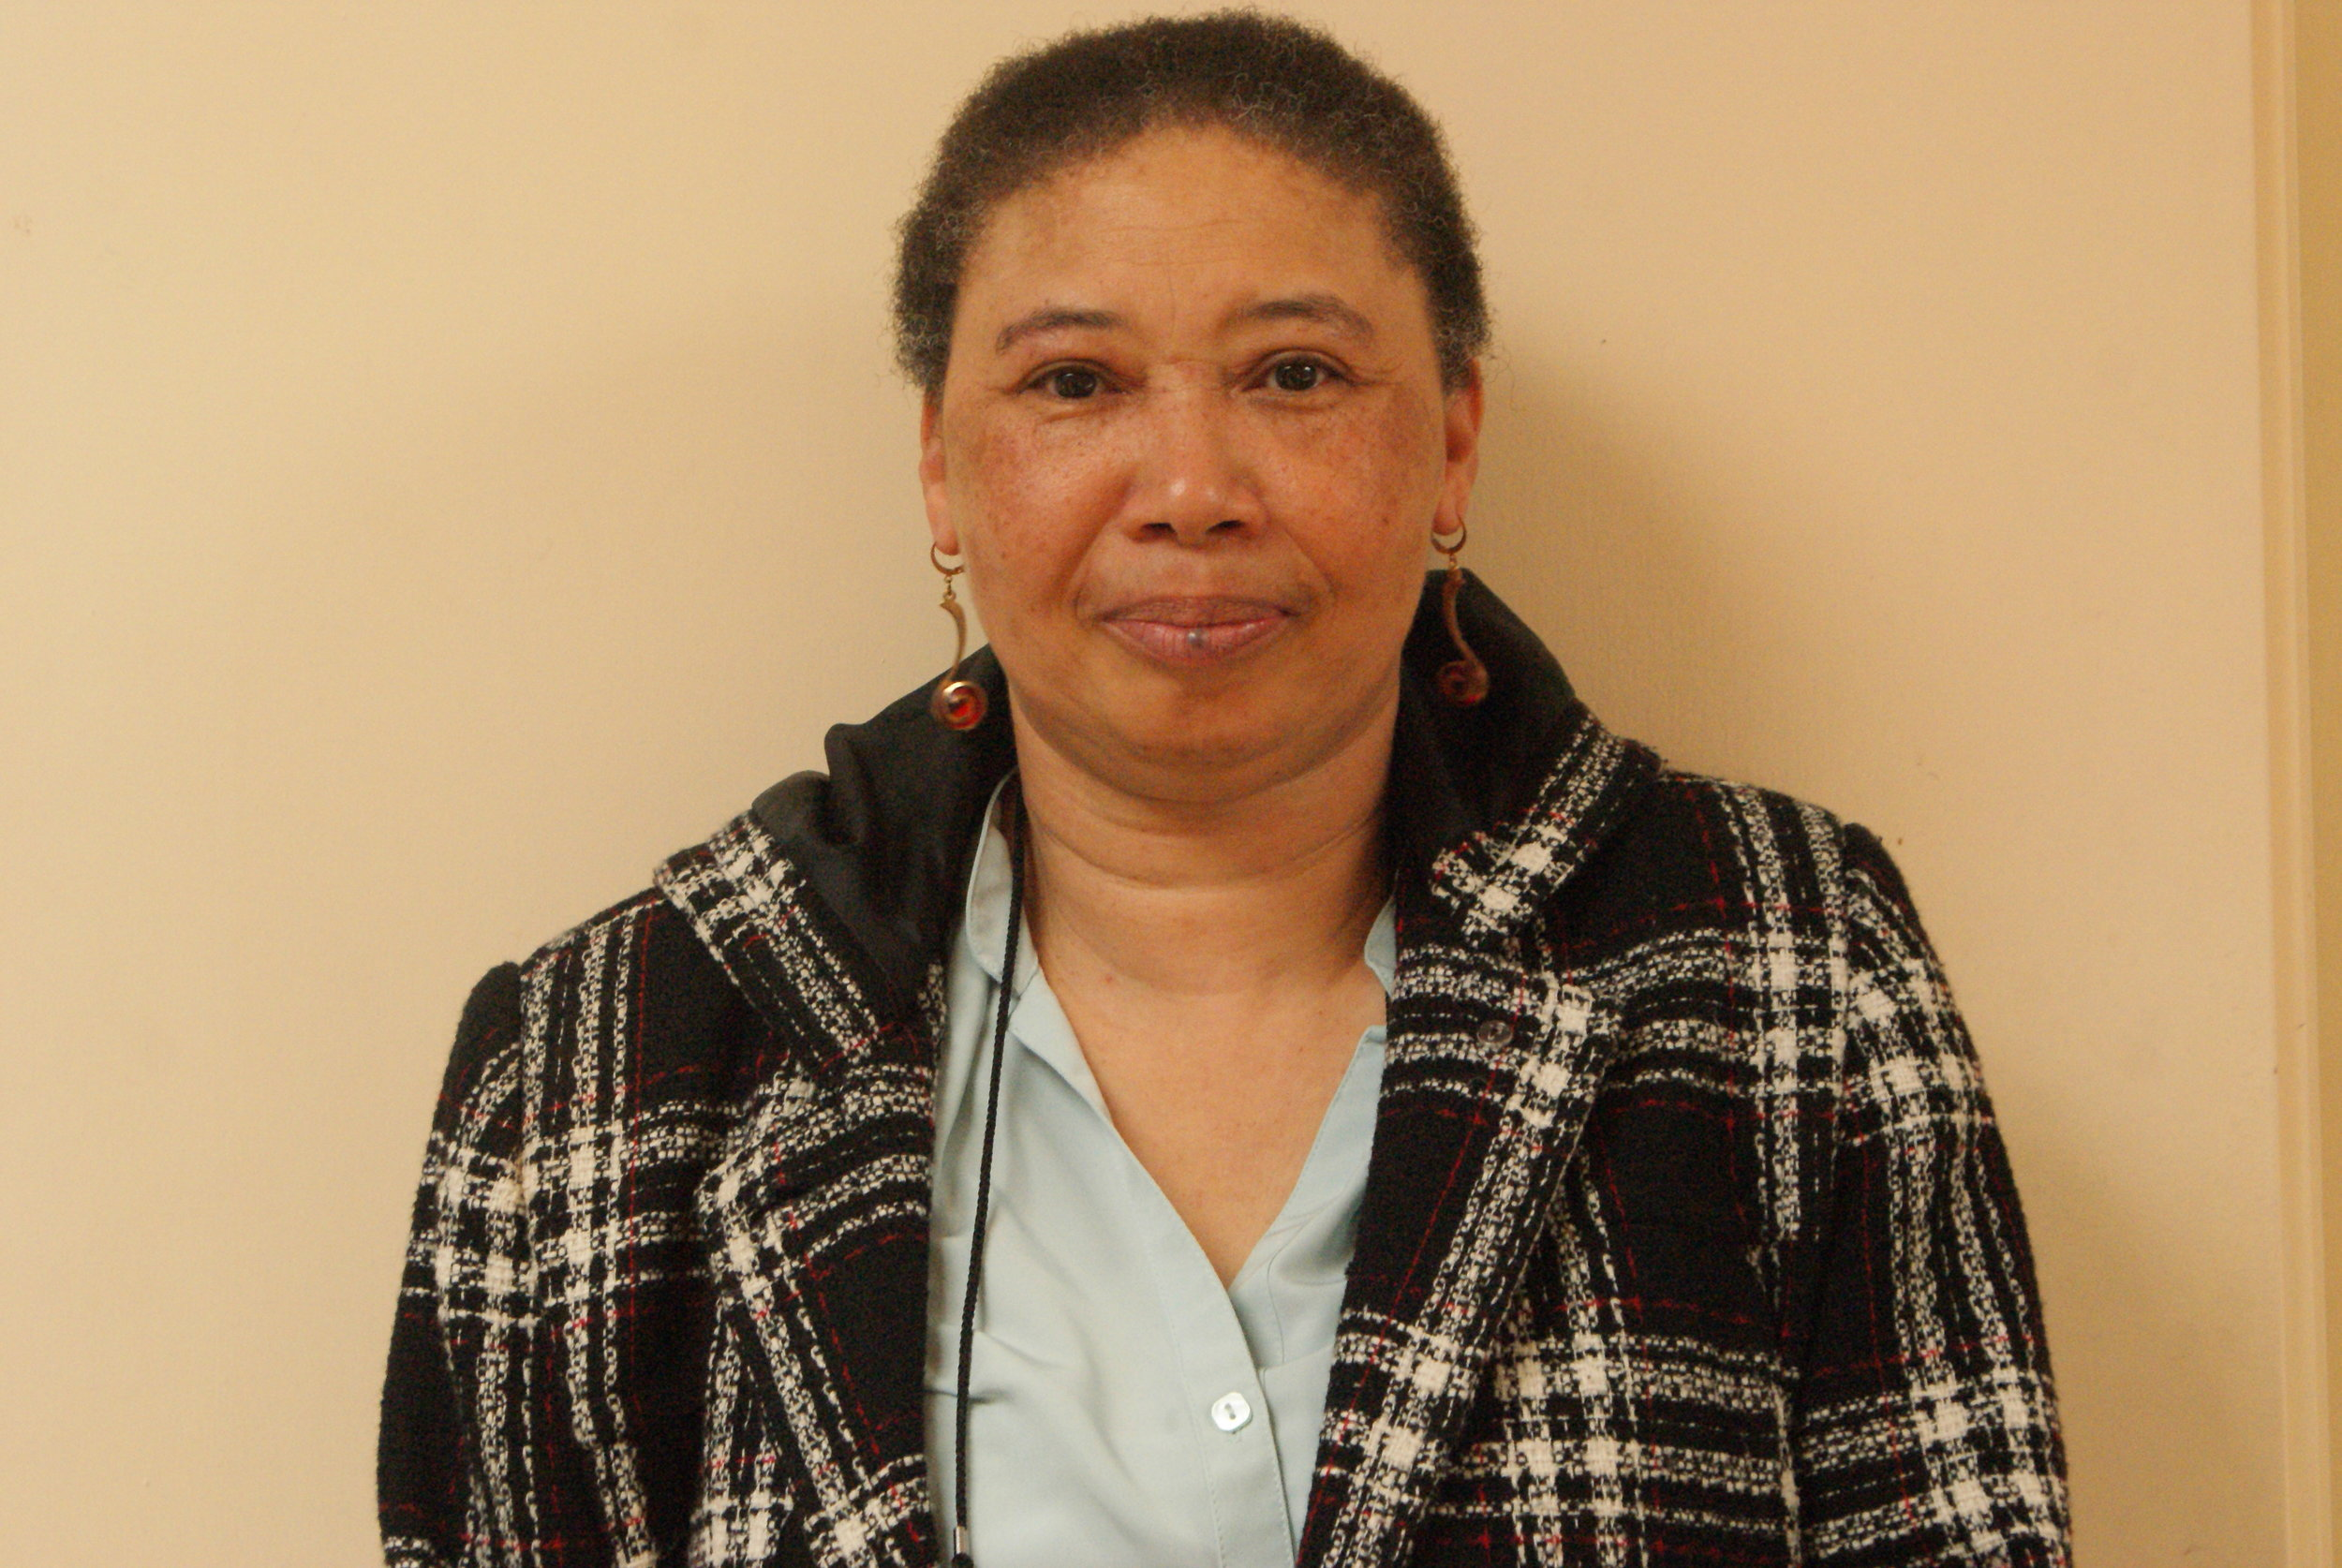 Angela Austin   Angela is the PCC Treasurer